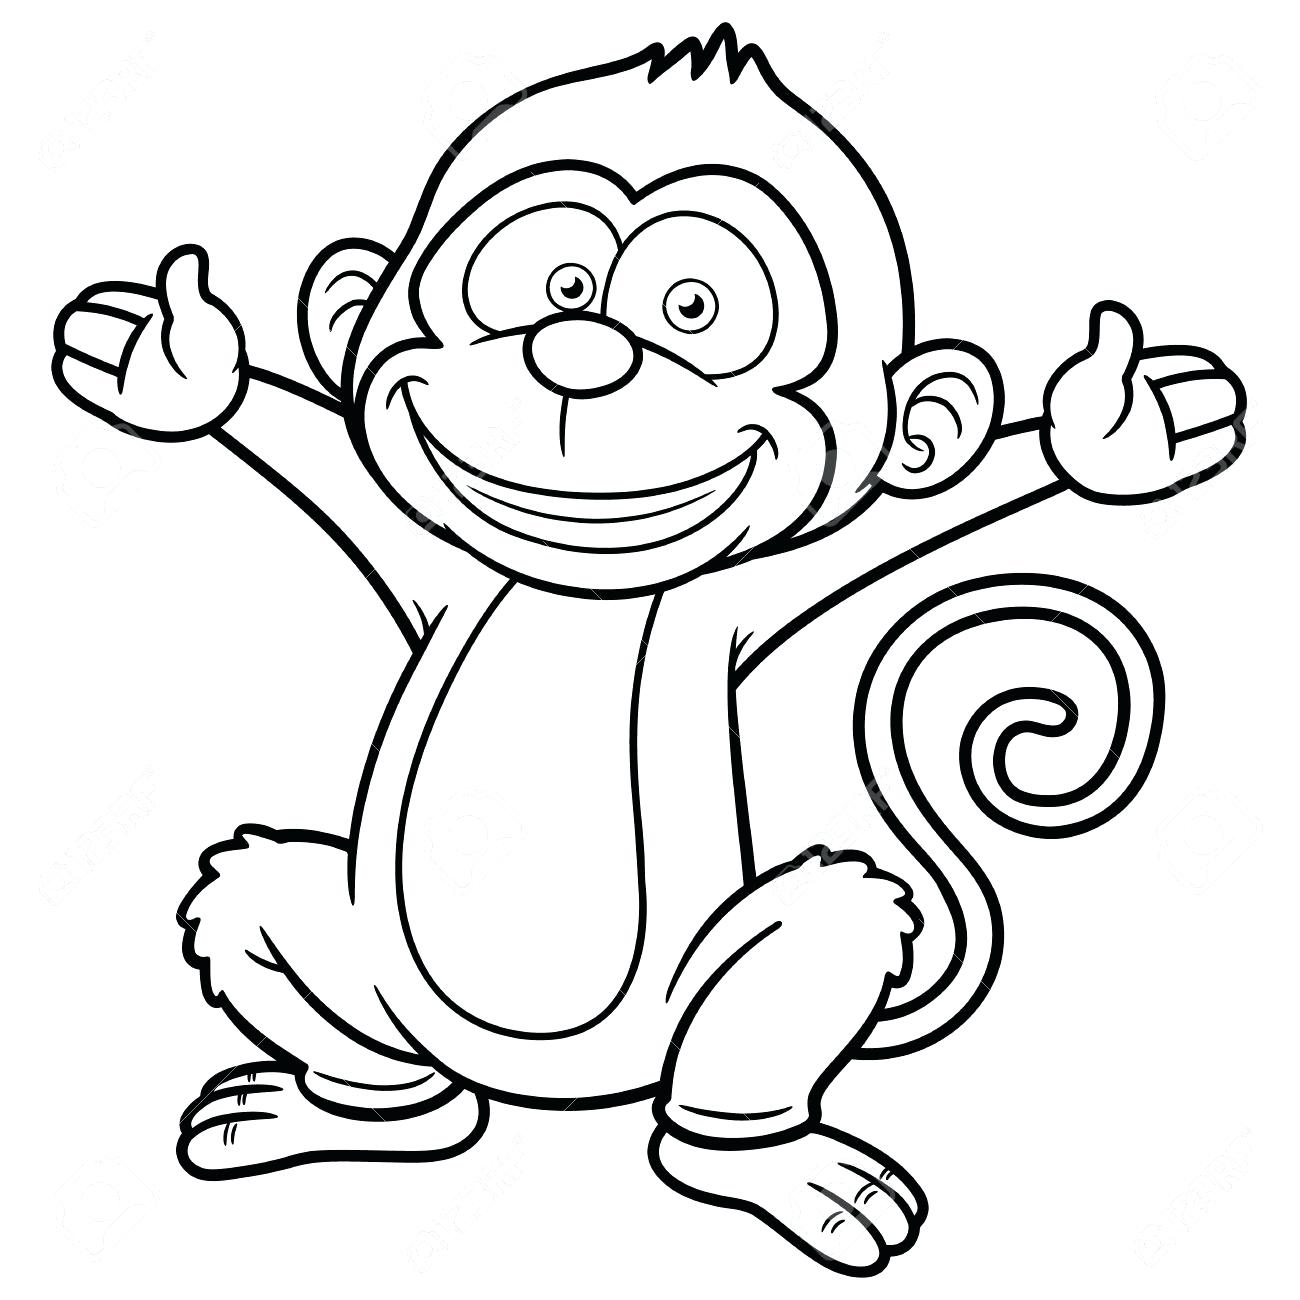 Monkey Line Drawing At Getdrawings